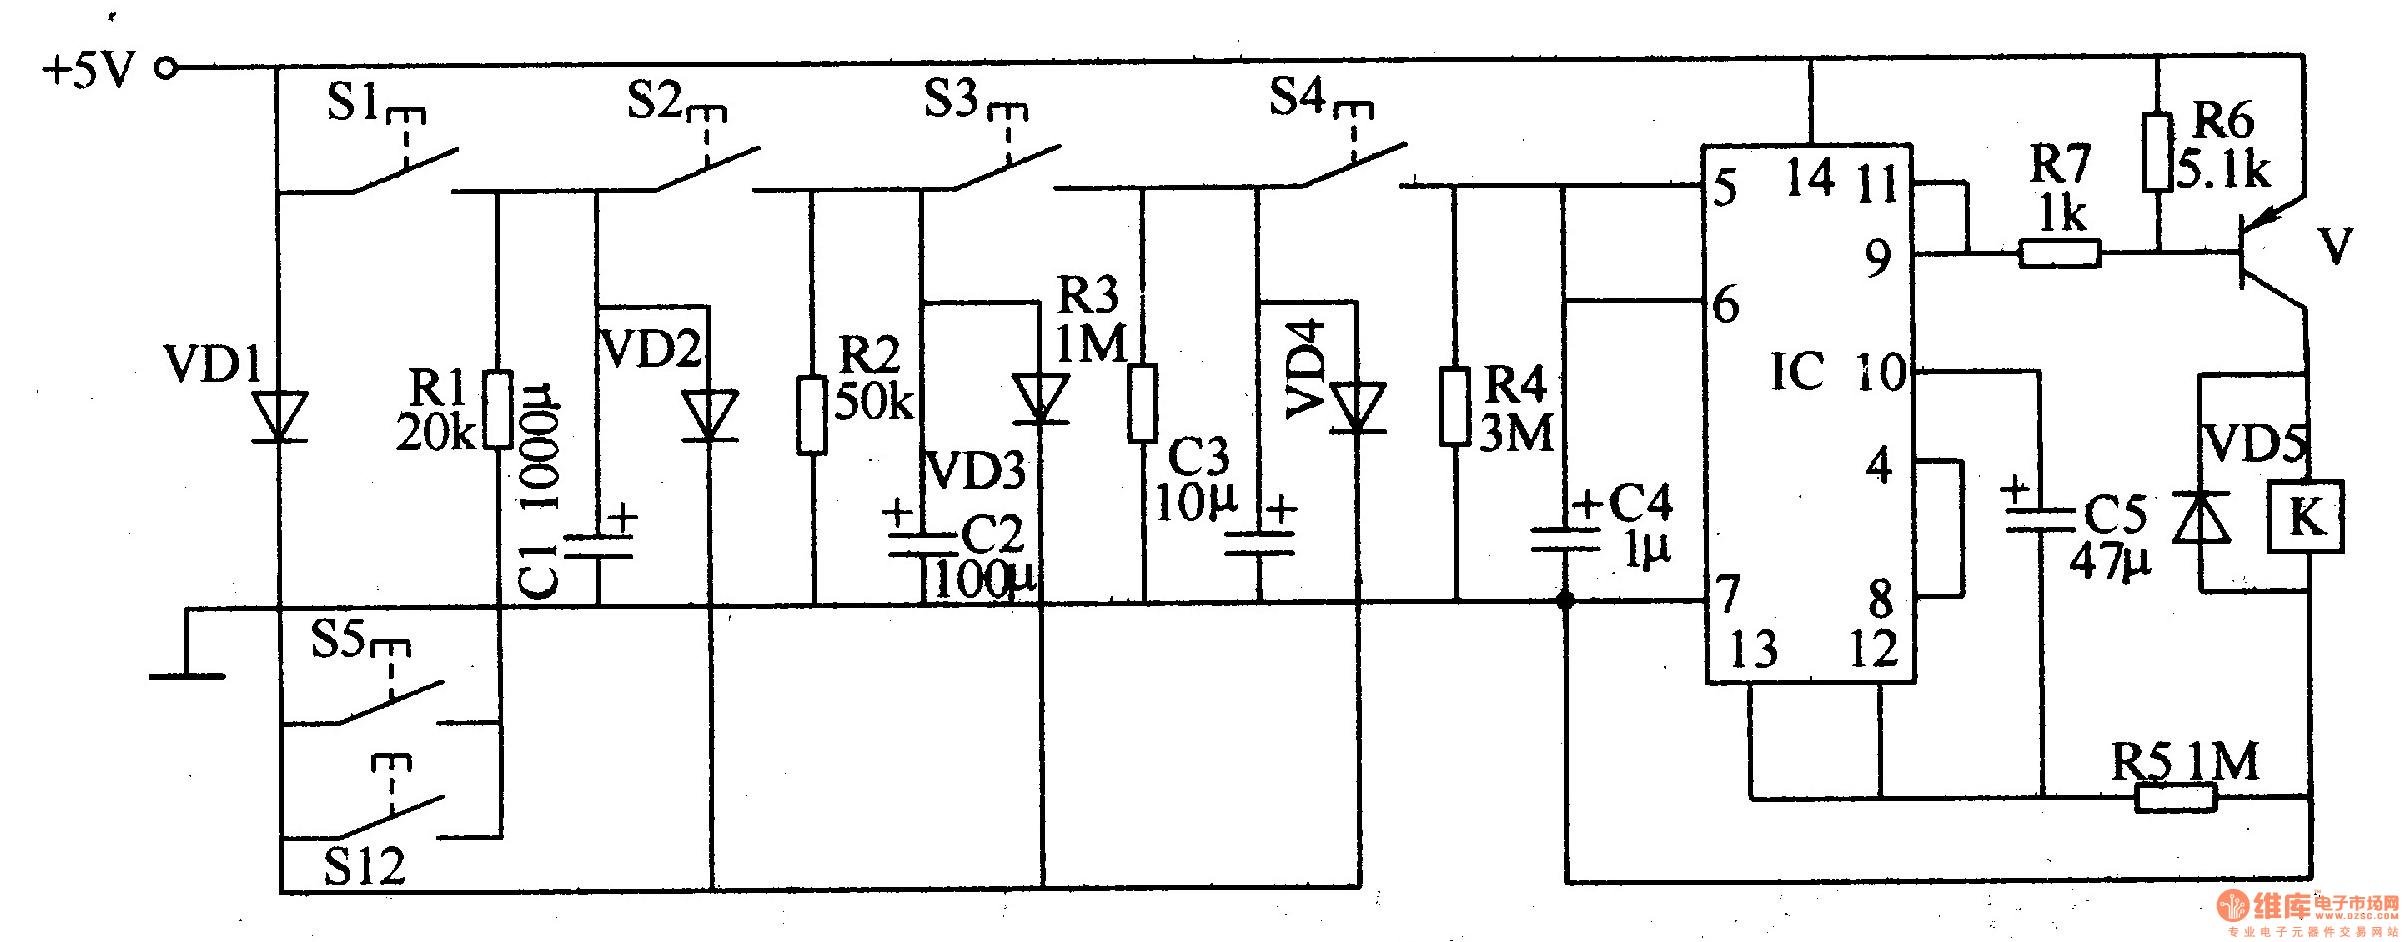 Electronic Password Switch 2 Electrical Equipment Circuit Seekiccom Circuitdiagram Sensorcircuit Currentdrainsensorhtml The